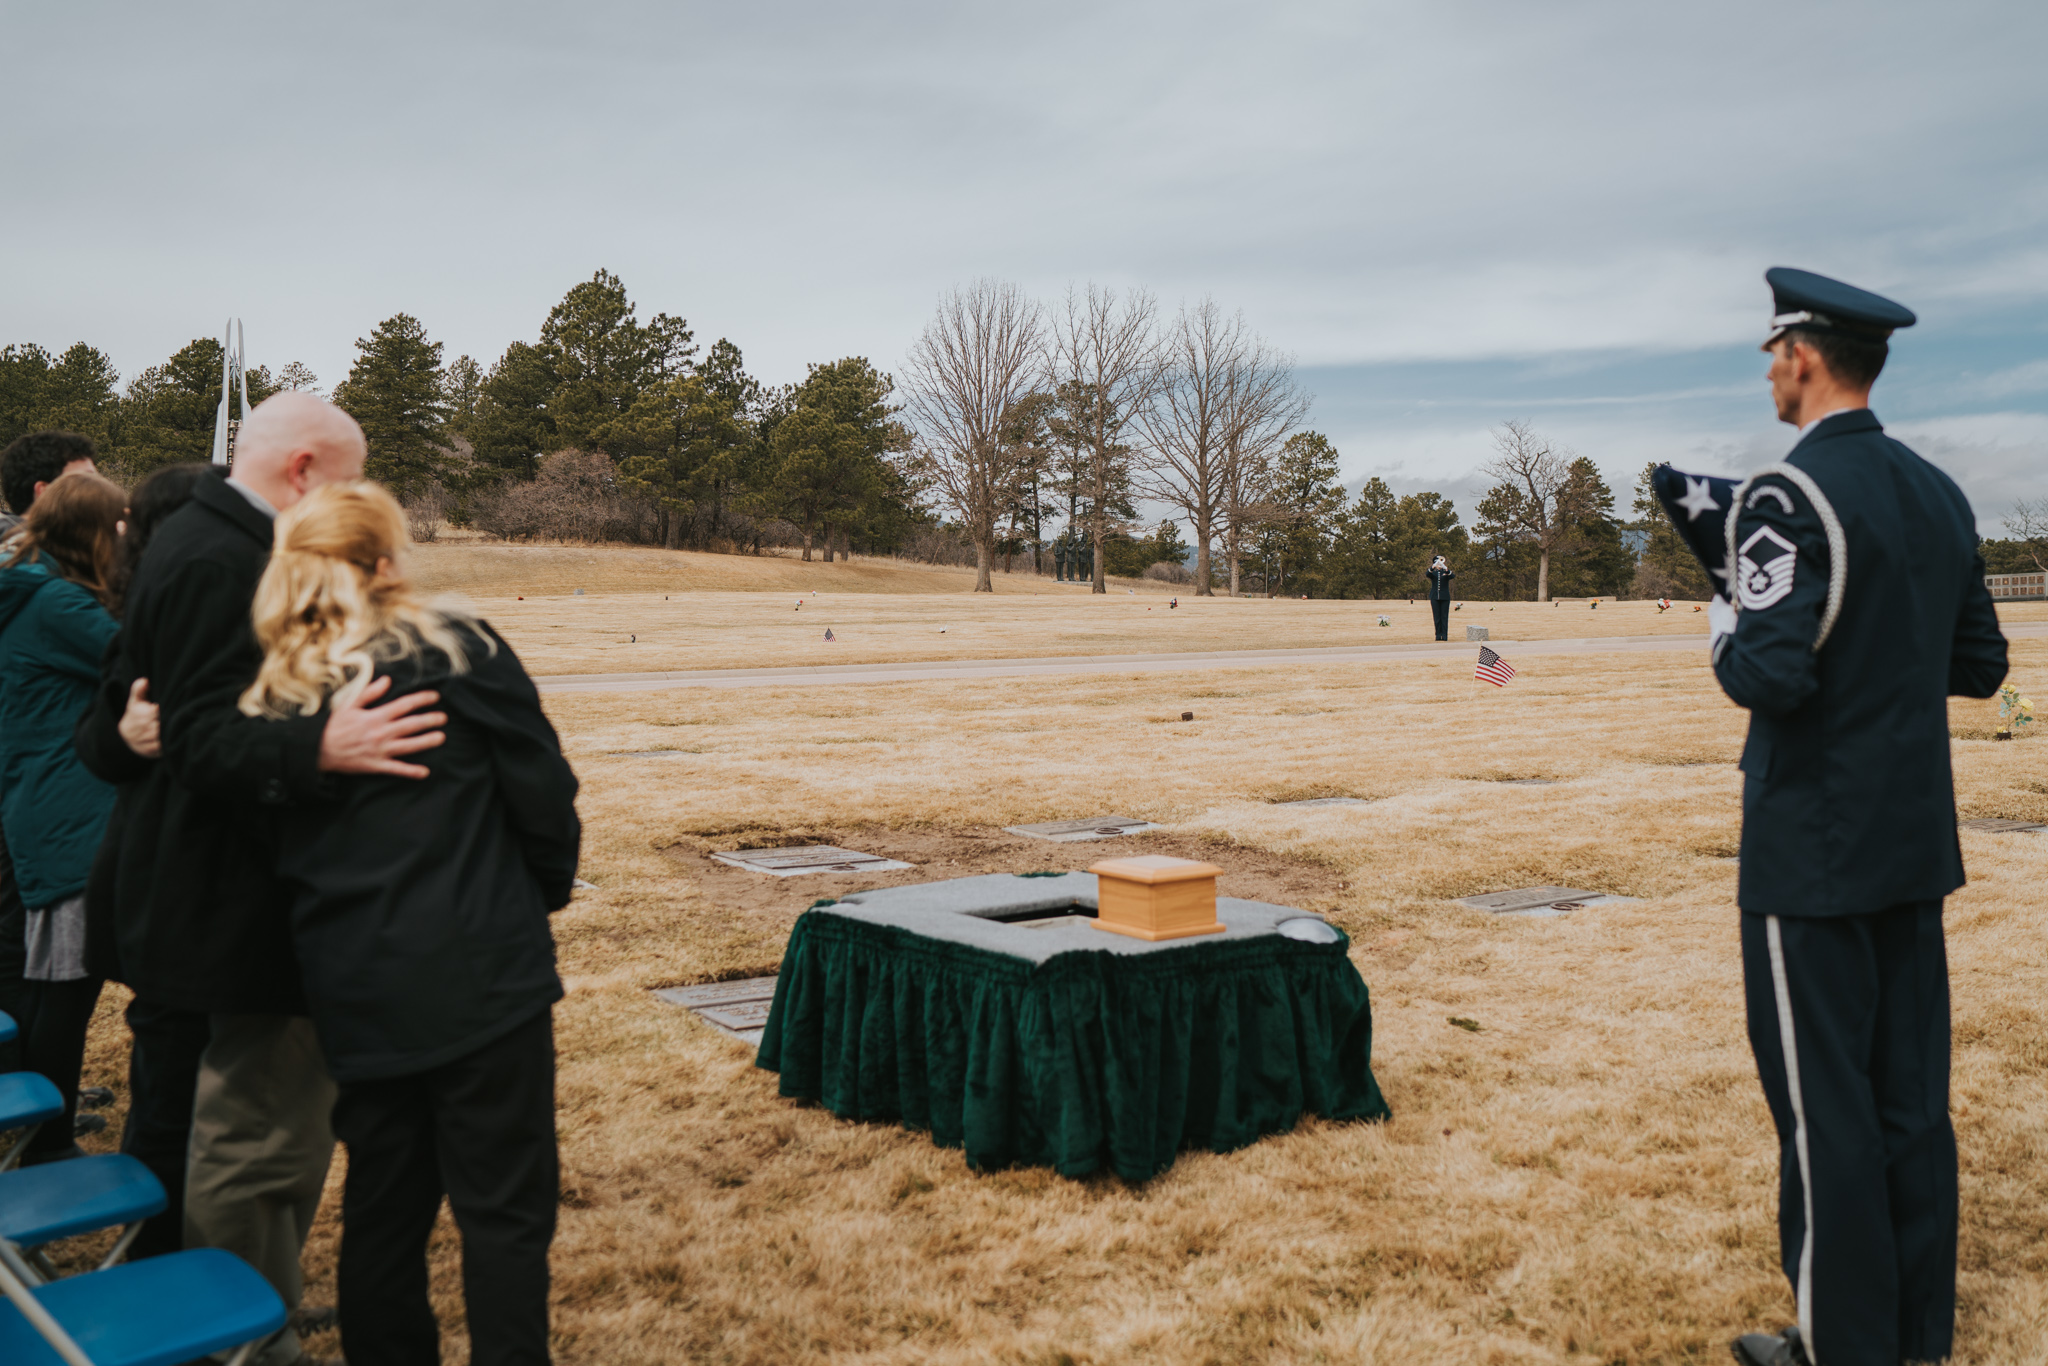 usafa-colorado-military-honours-burial-funeral-photography-grace-elizabeth-colchester-essex-alternative-wedding-lifestyle-photographer (74 of 127).jpg